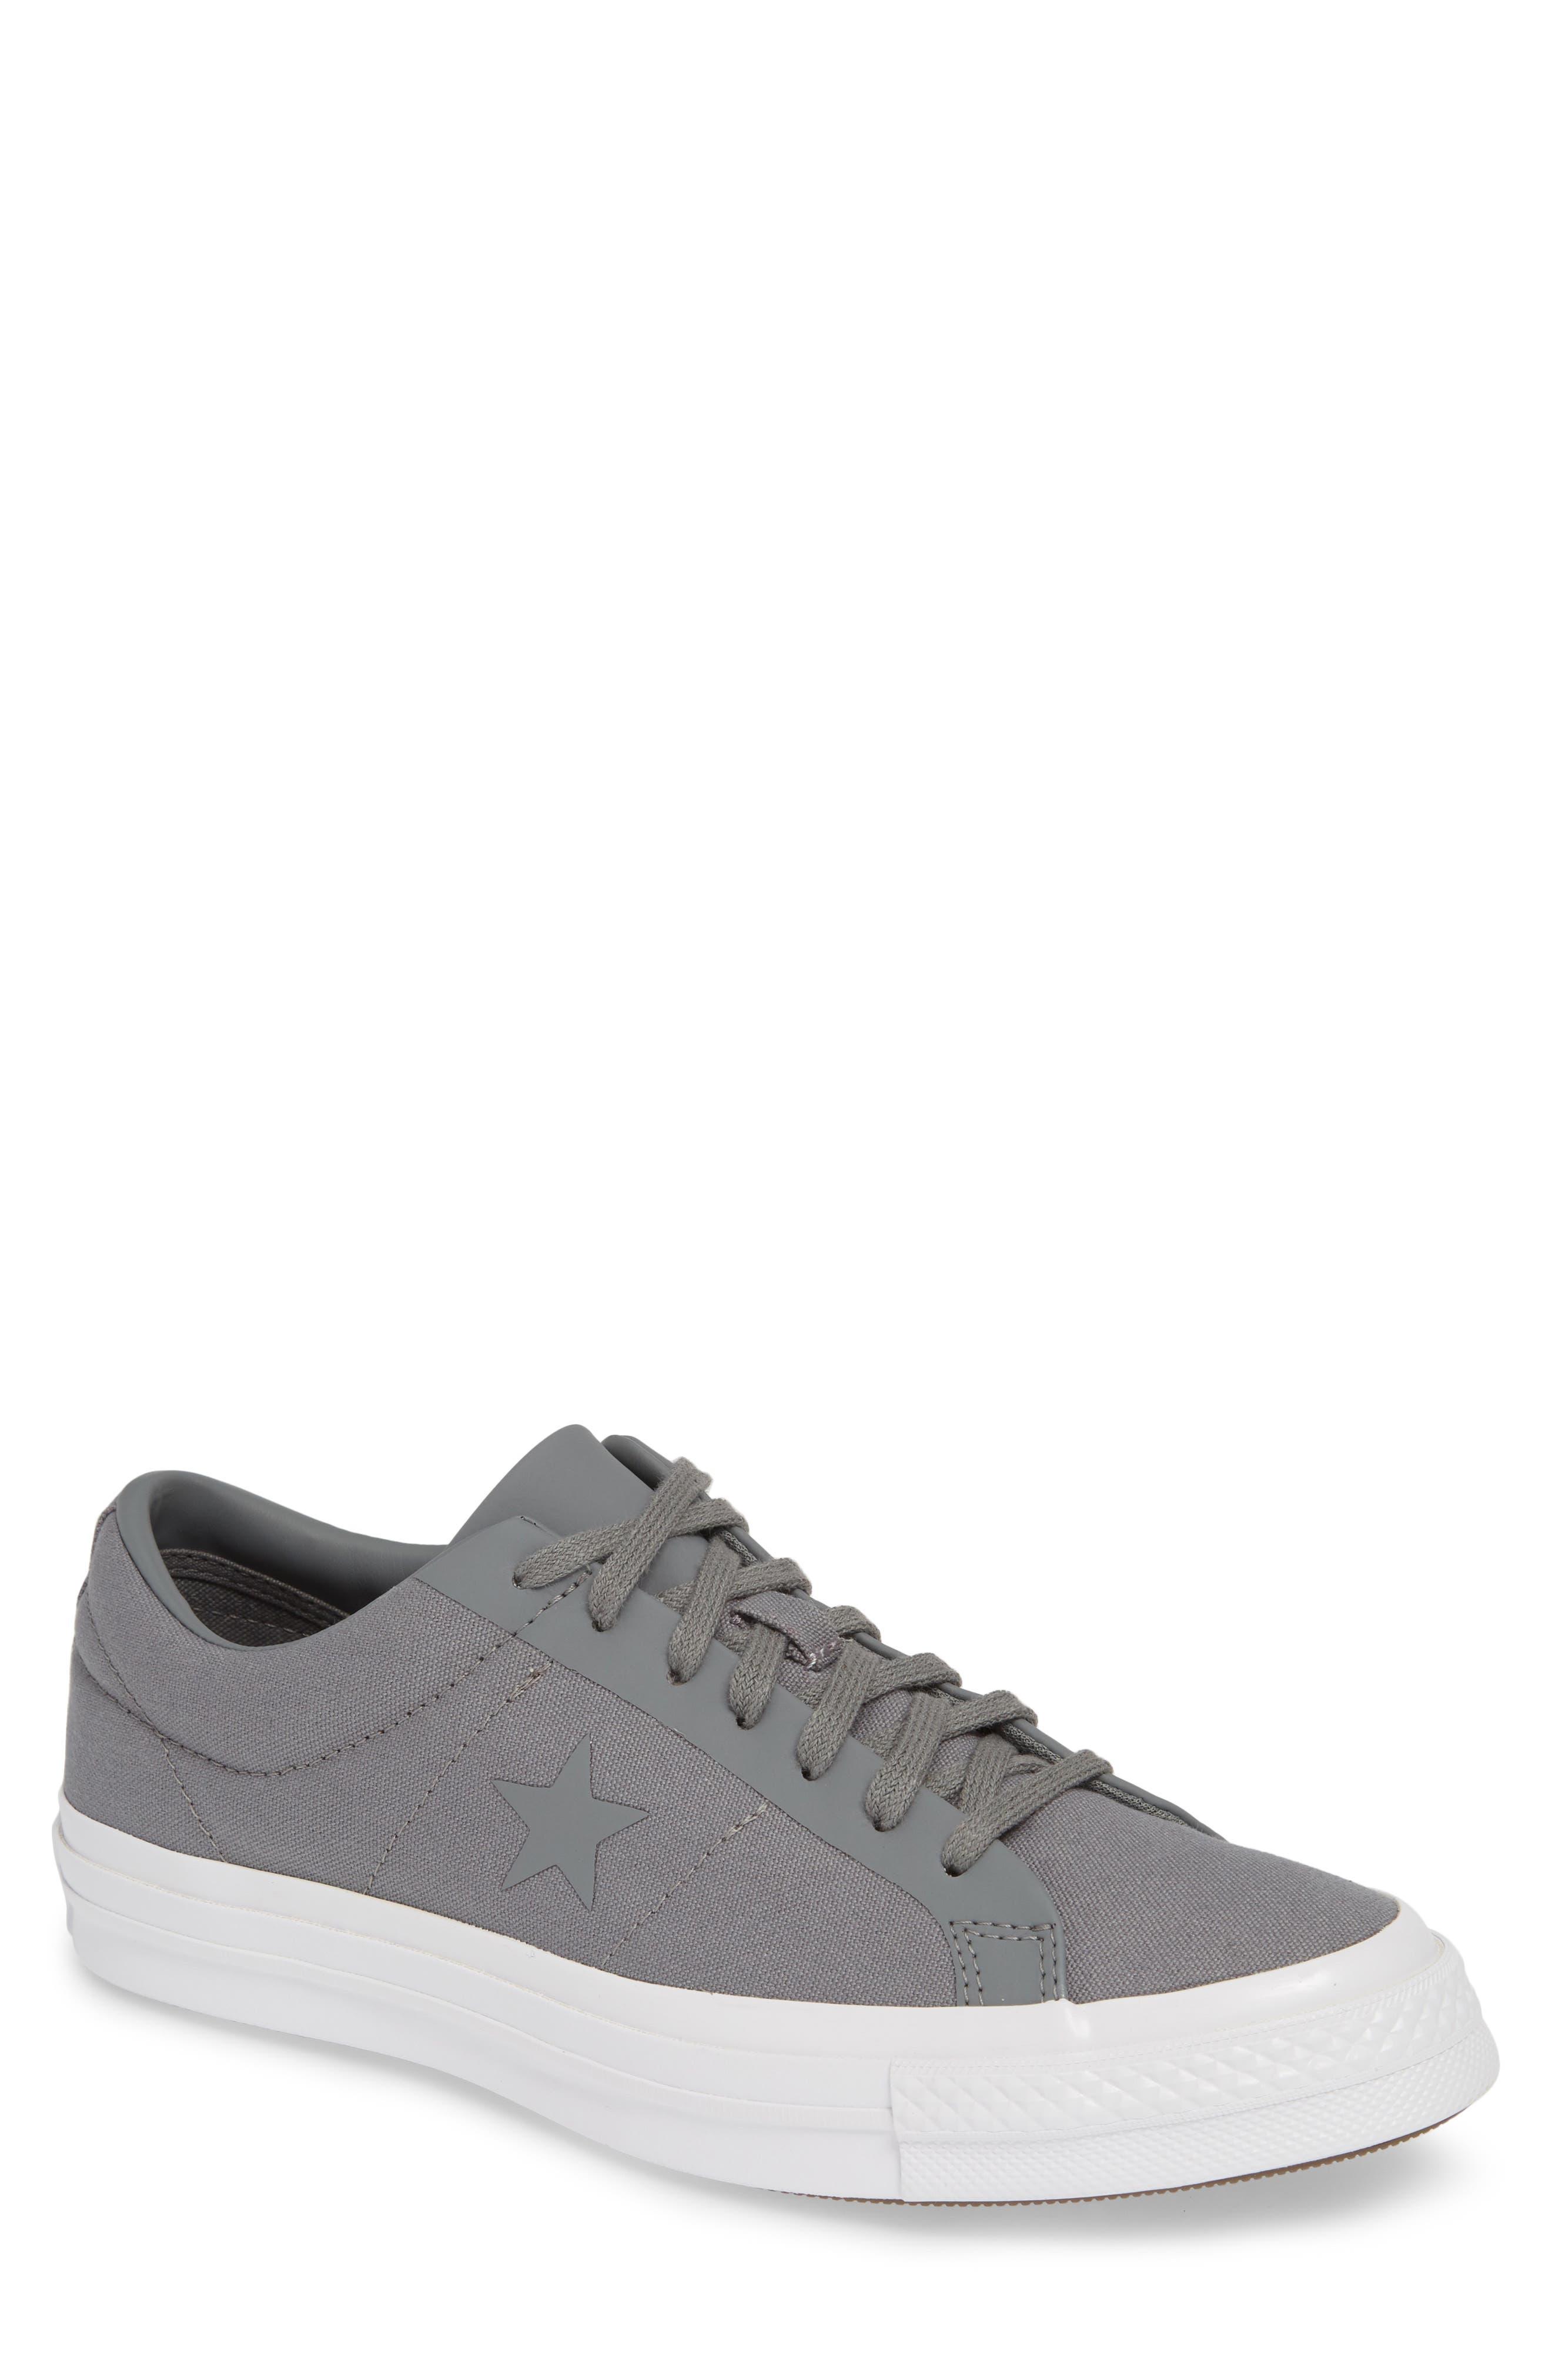 Converse One Star Sneaker, Grey